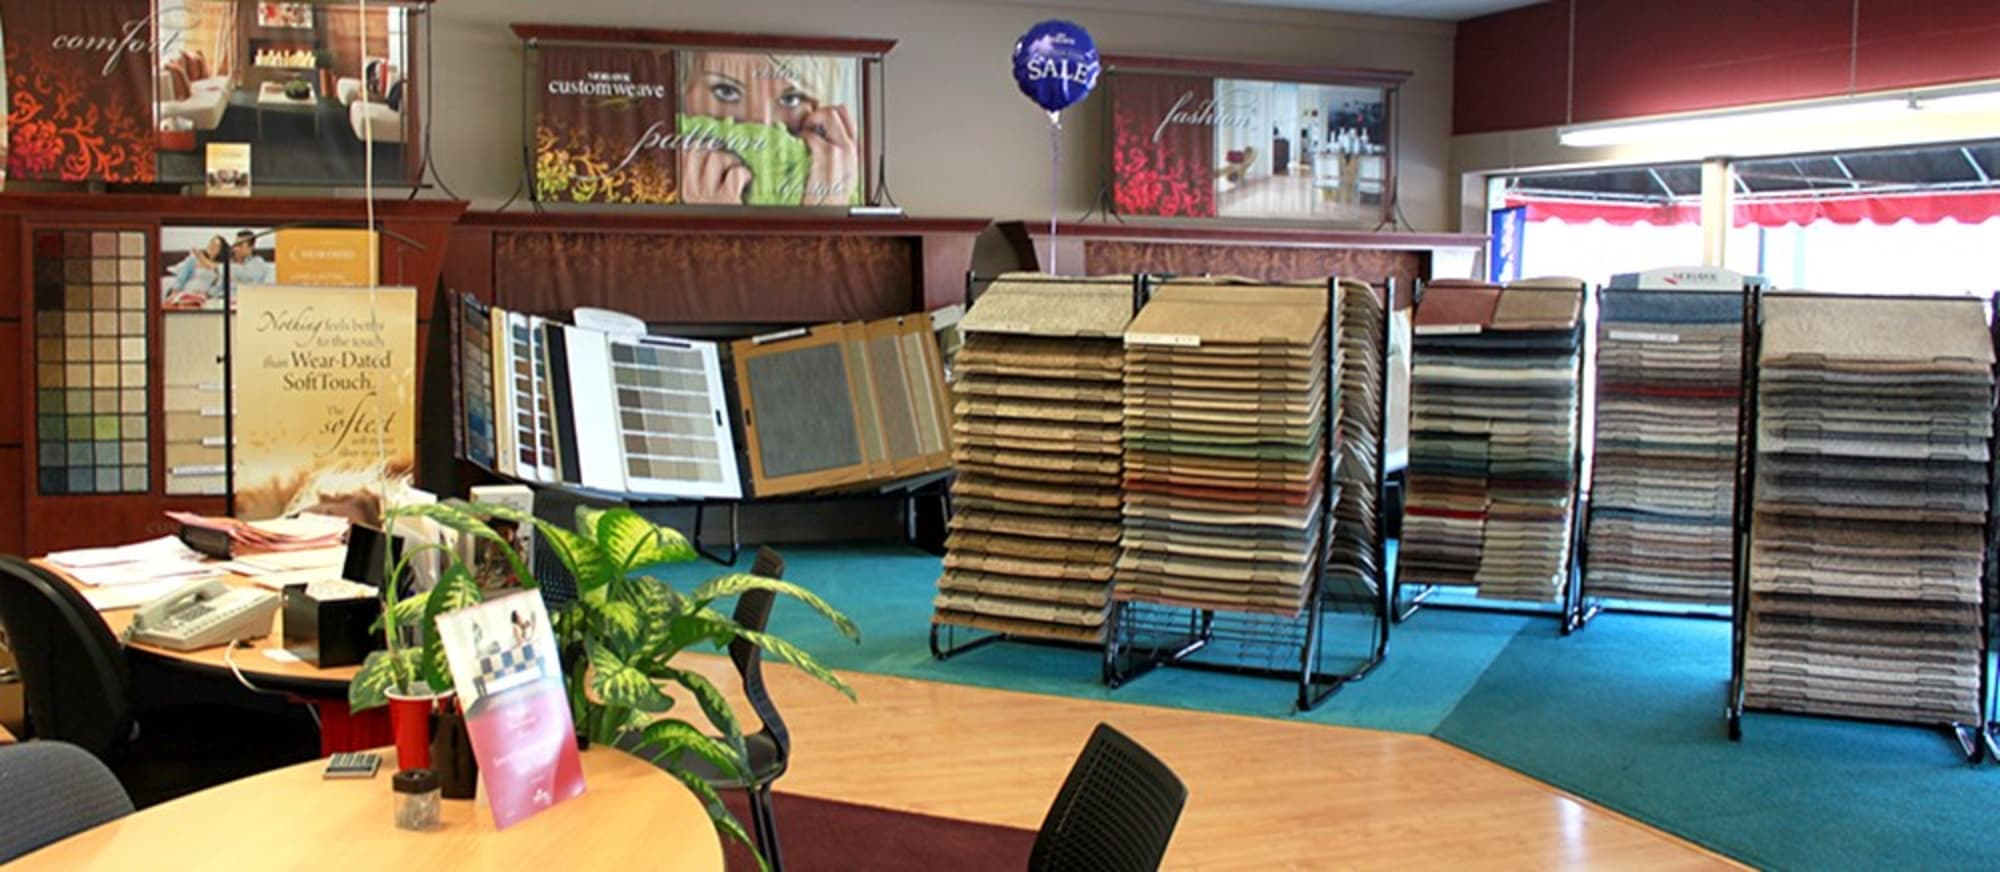 Supreme Floor Covering, Inc  - 3228 Bay Rd Saginaw, MI 48603